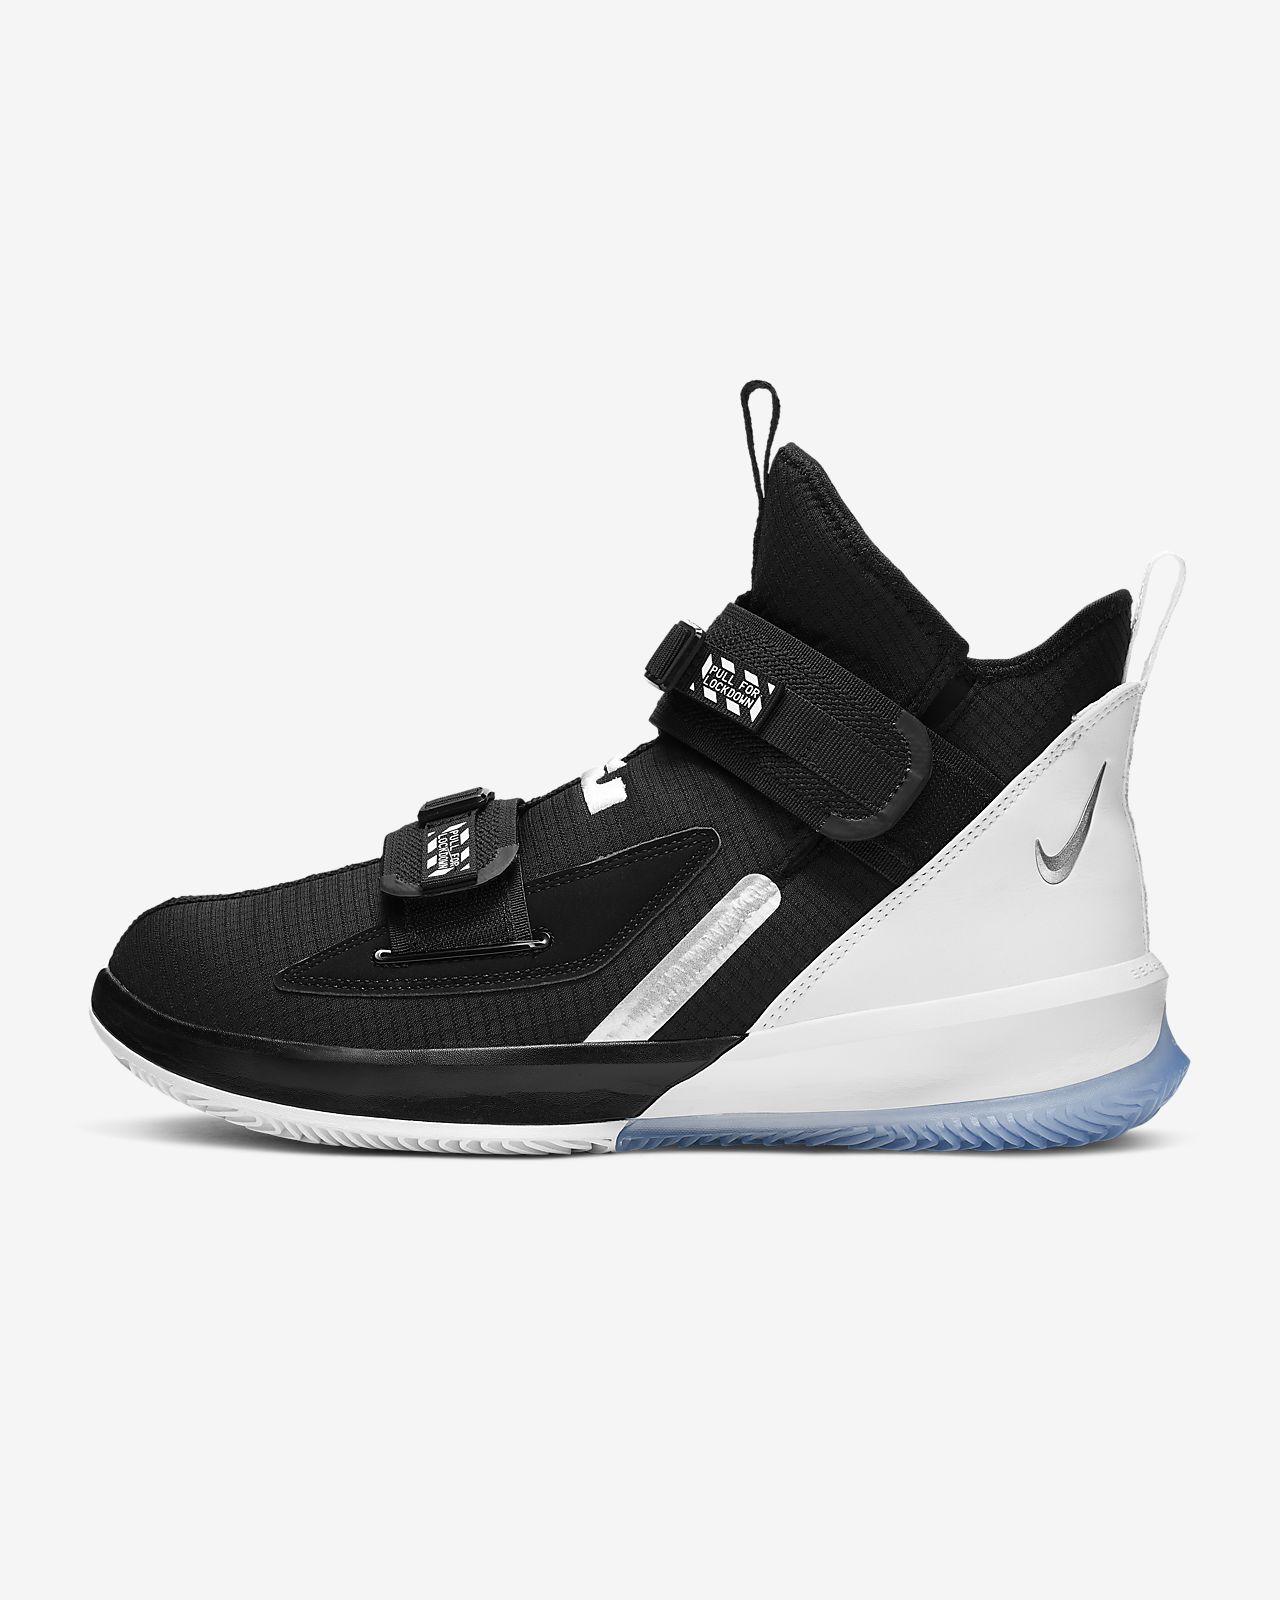 LeBron Soldier XIII SFG Basketball Shoe